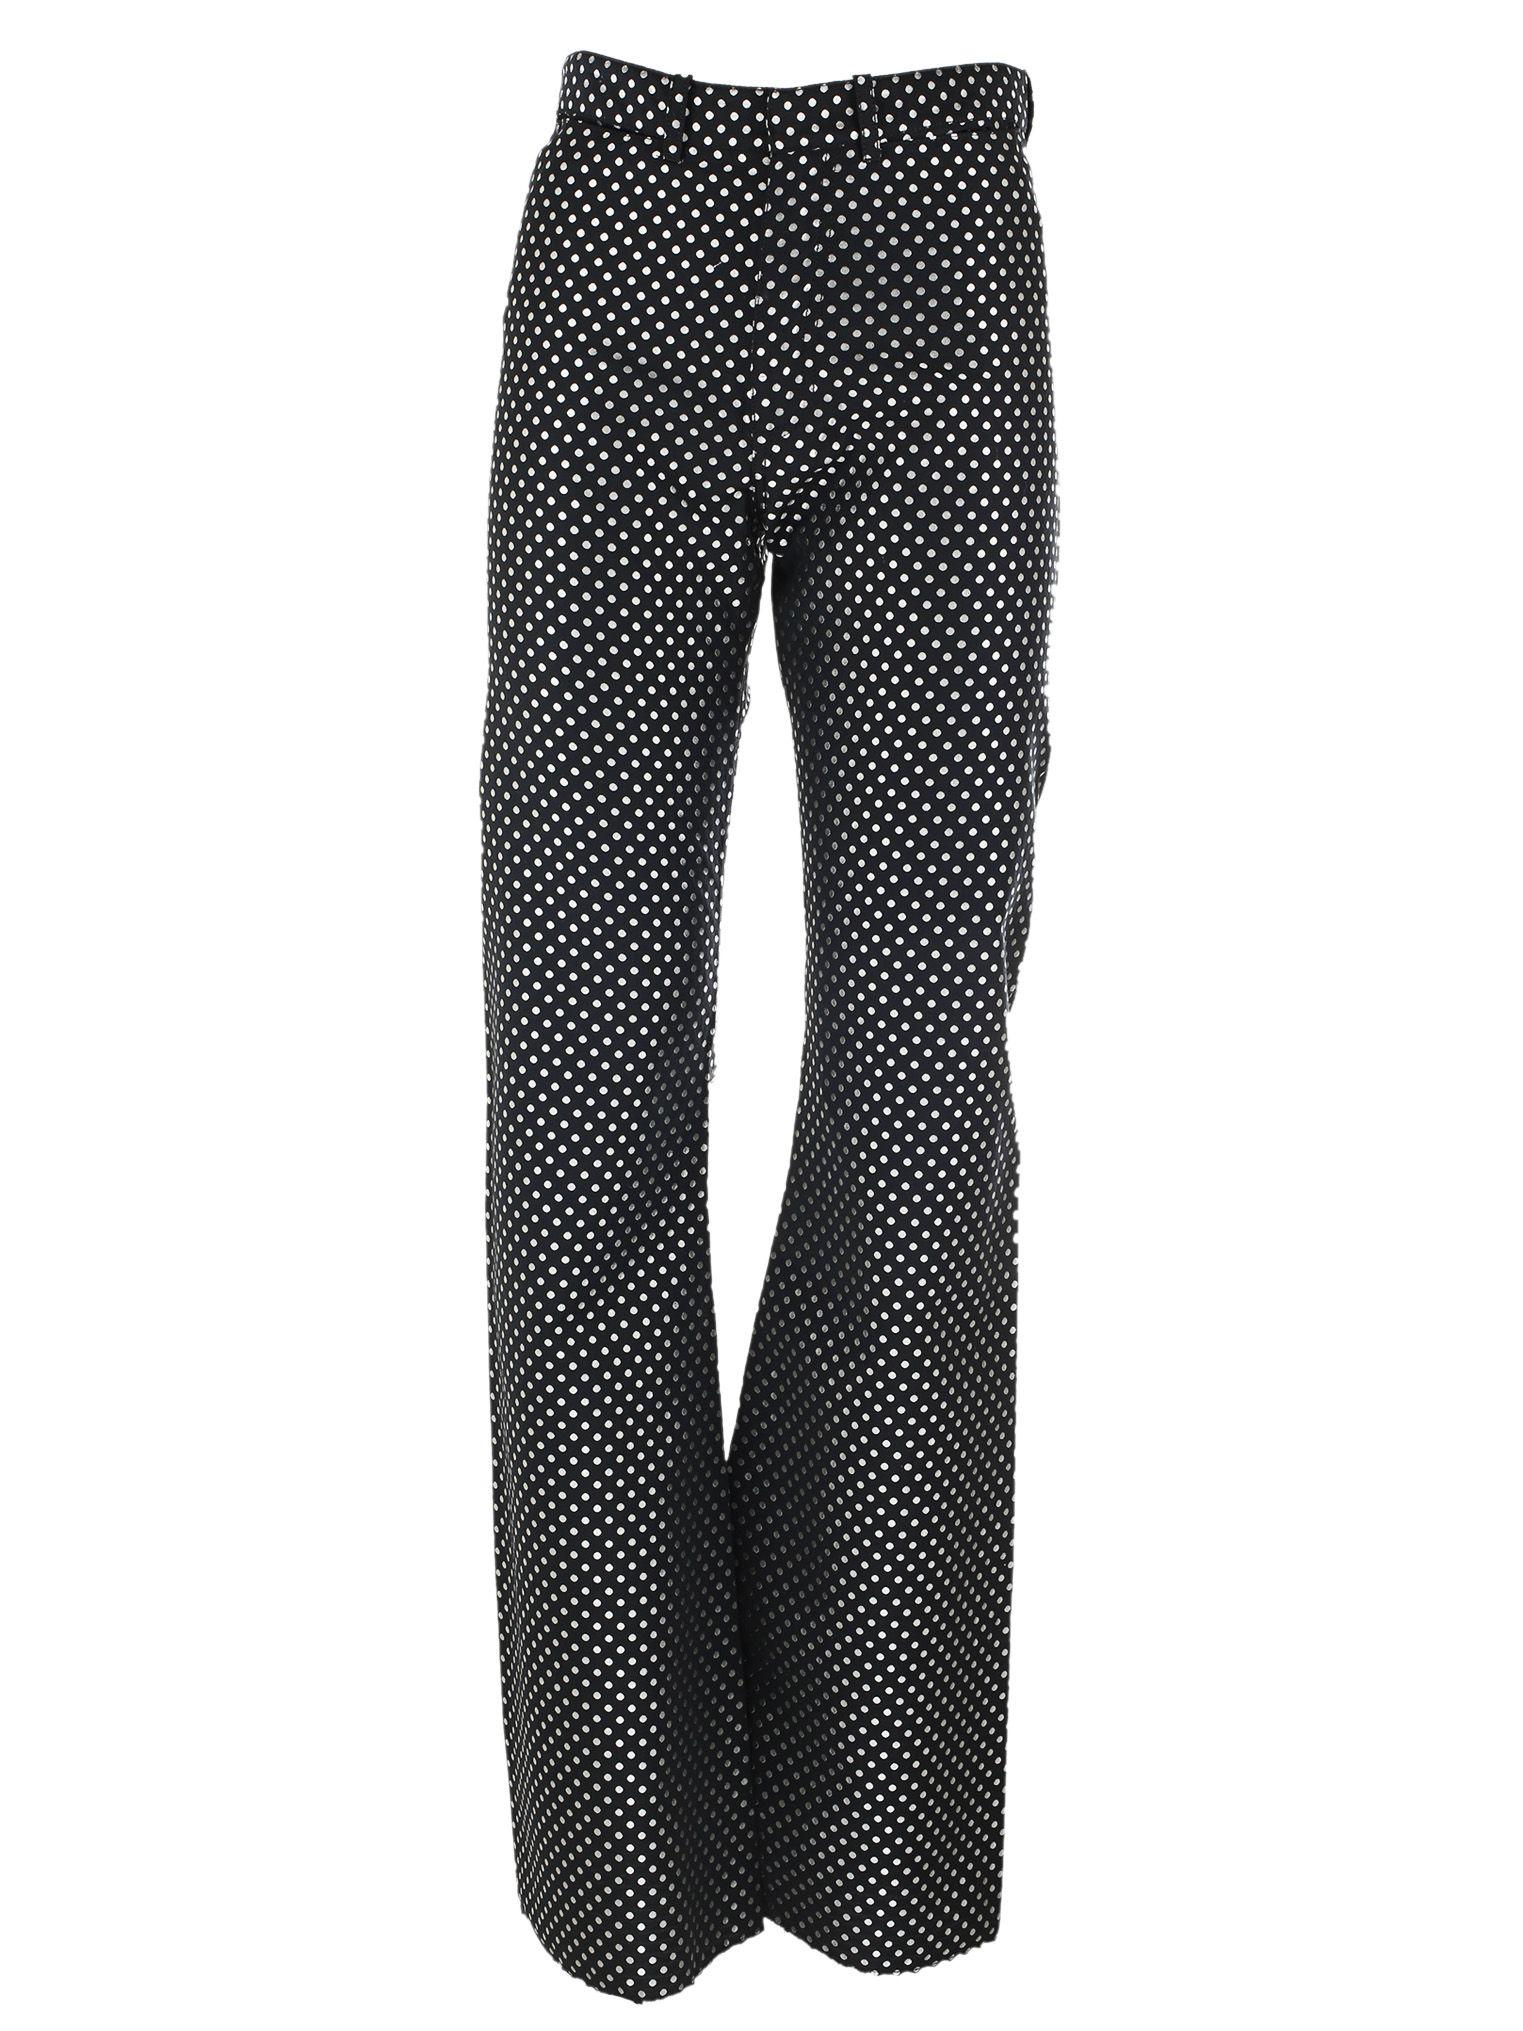 Marques Almeida Polka Dot Trousers